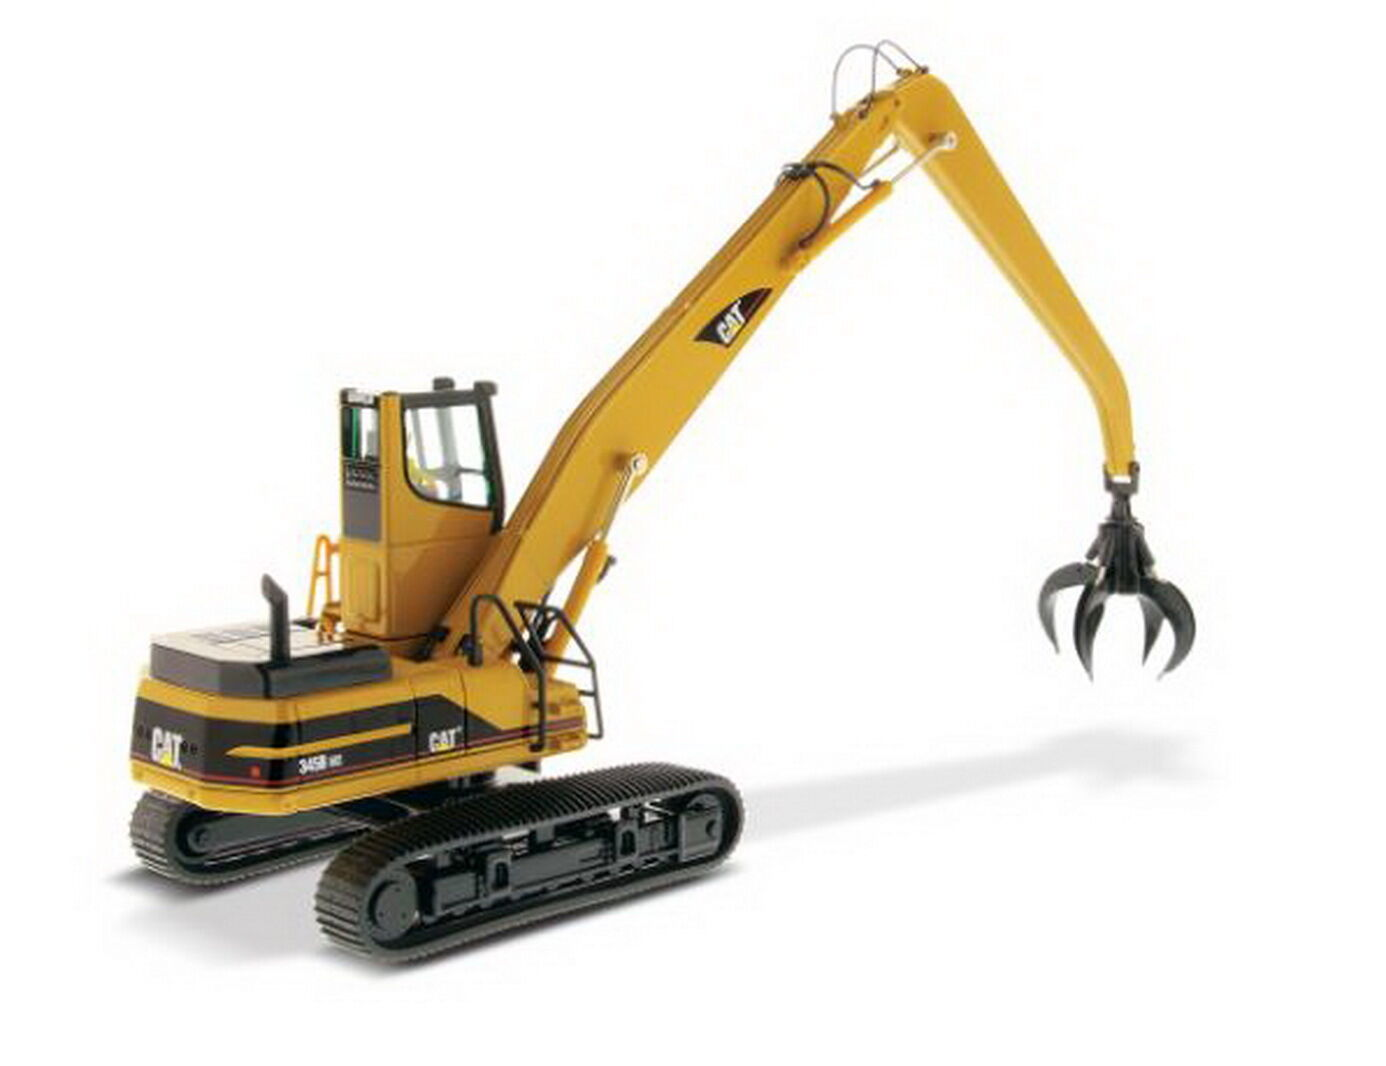 1/50 DM Caterpillar CAT 345B SERIE II Material Handler Modello Diecast #85080